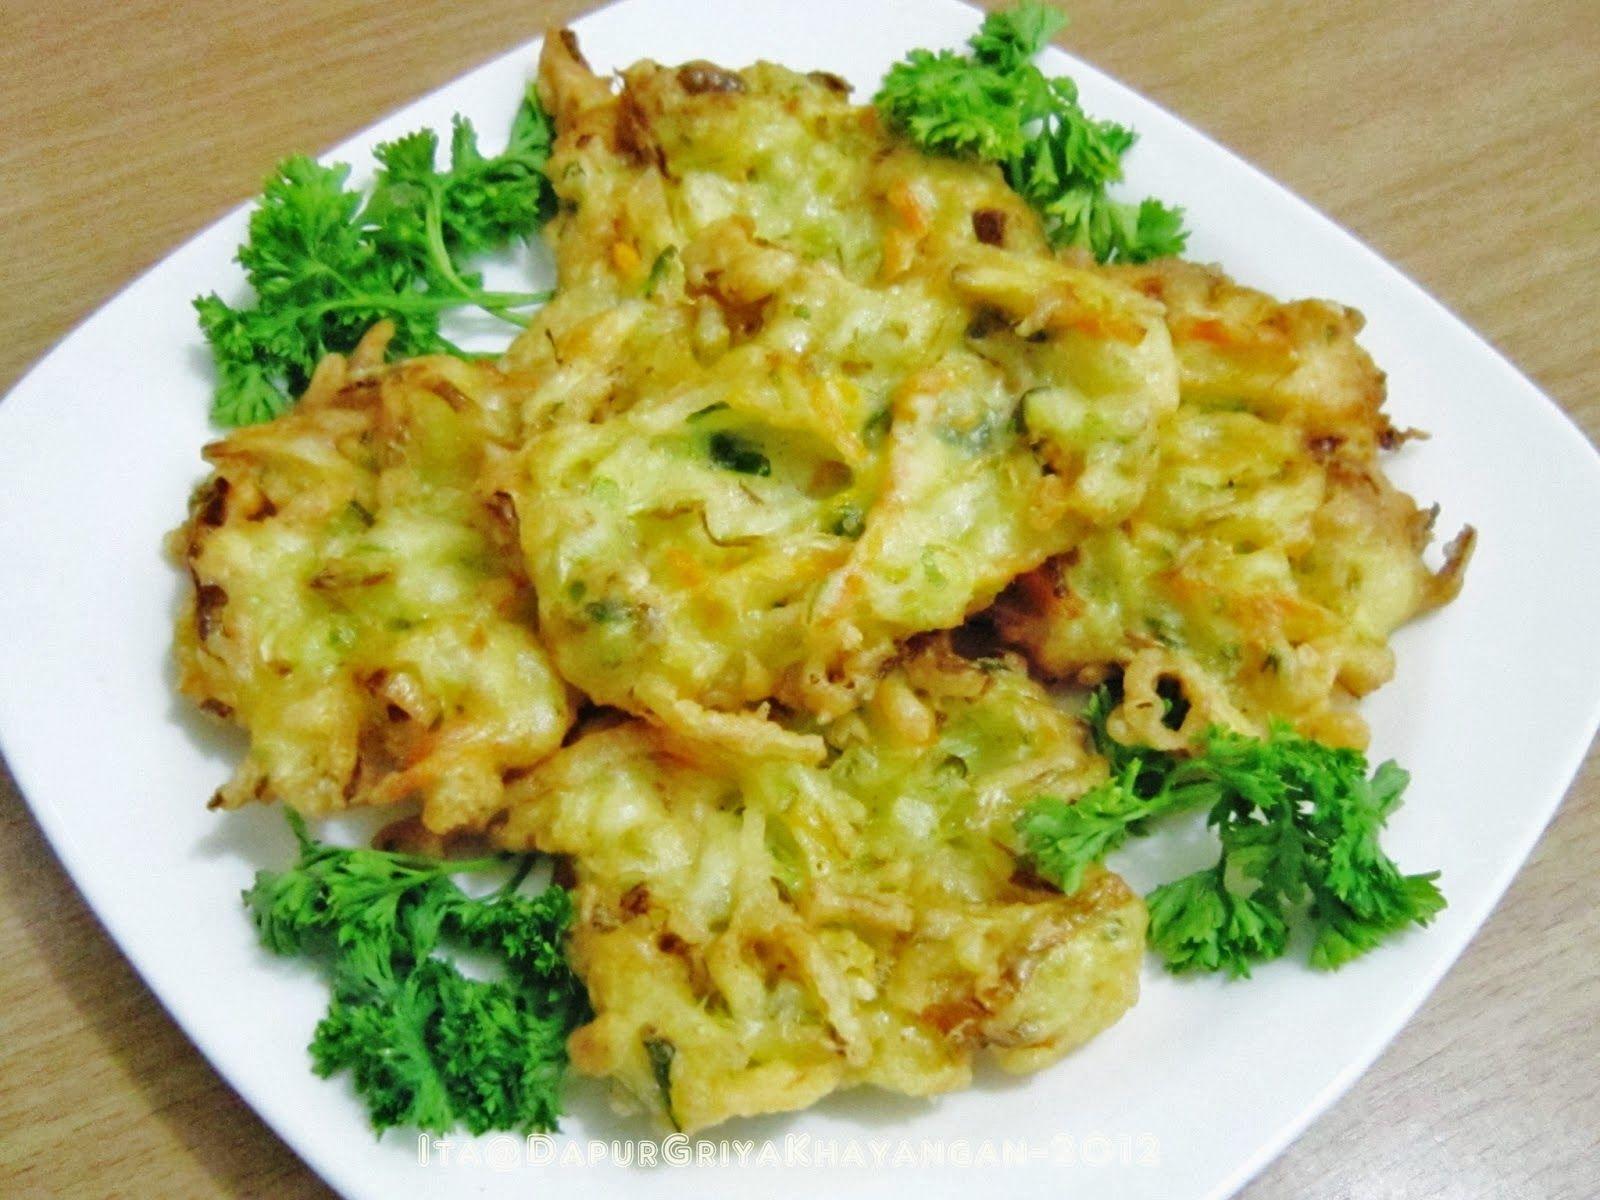 Resep Membuat Gorengan Bakwan Kumpulan Resep Masakan Ibu Indonesian Food Cauliflower Chicken